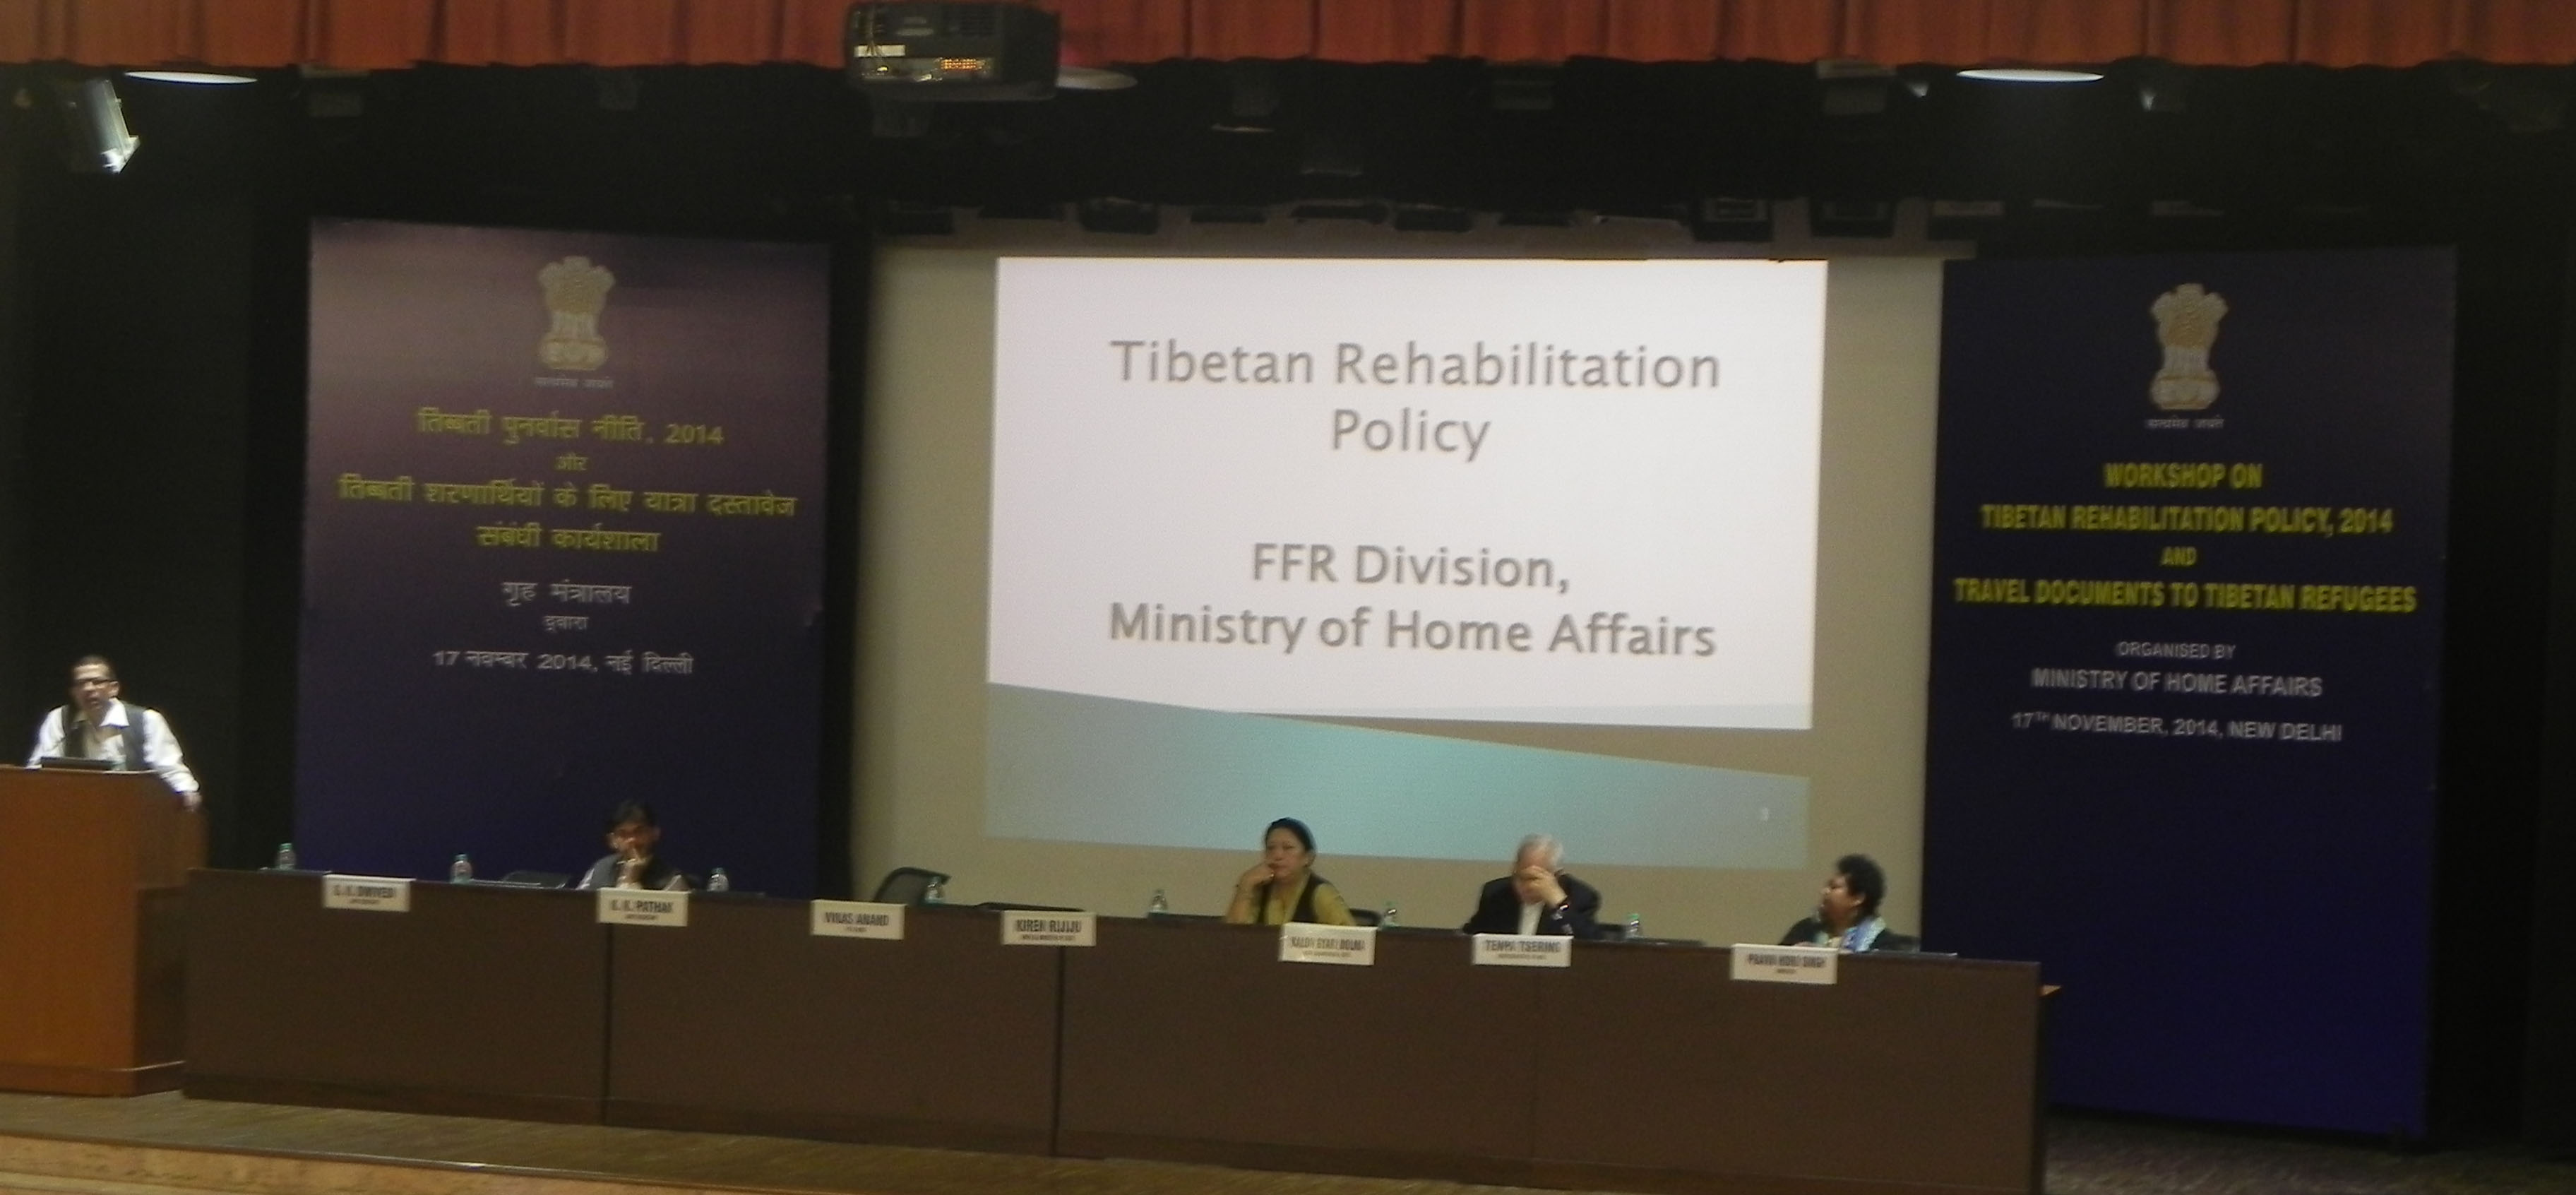 India explains rehabilitation policy to exile Tibetan officials